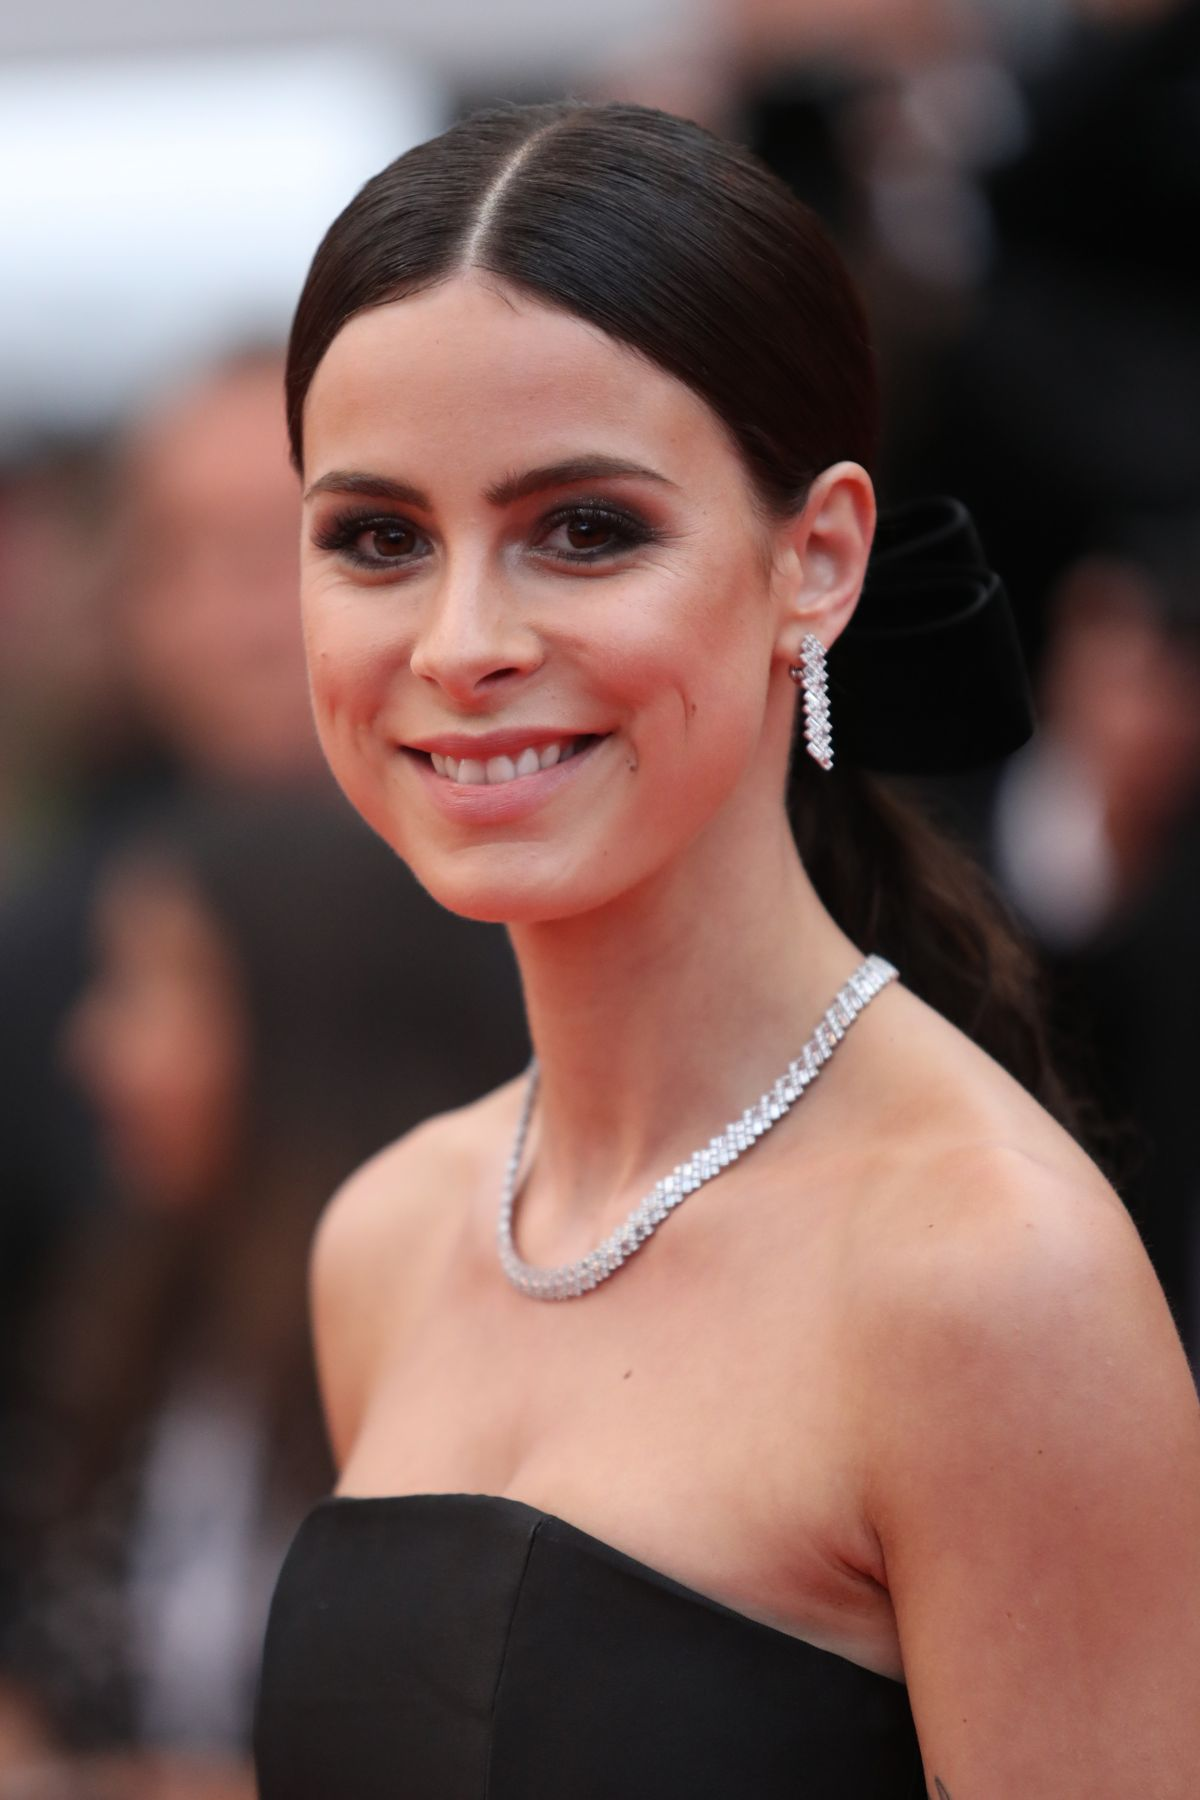 Lena Meyer Landrut At Blackkklansman Premiere At Cannes Film Festival